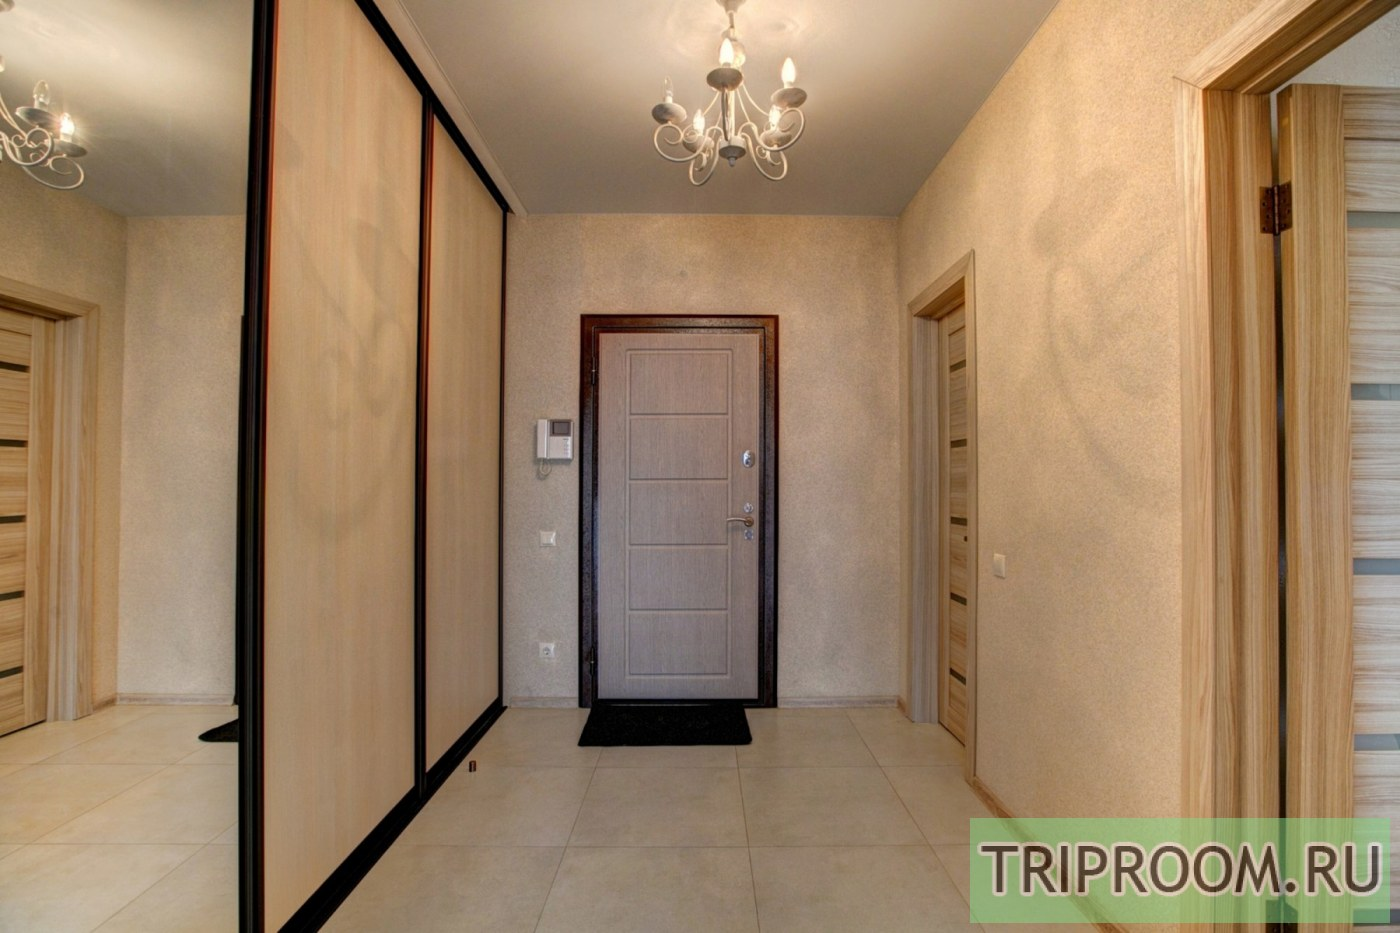 1-комнатная квартира посуточно (вариант № 38810), ул. Революции проспект, фото № 8